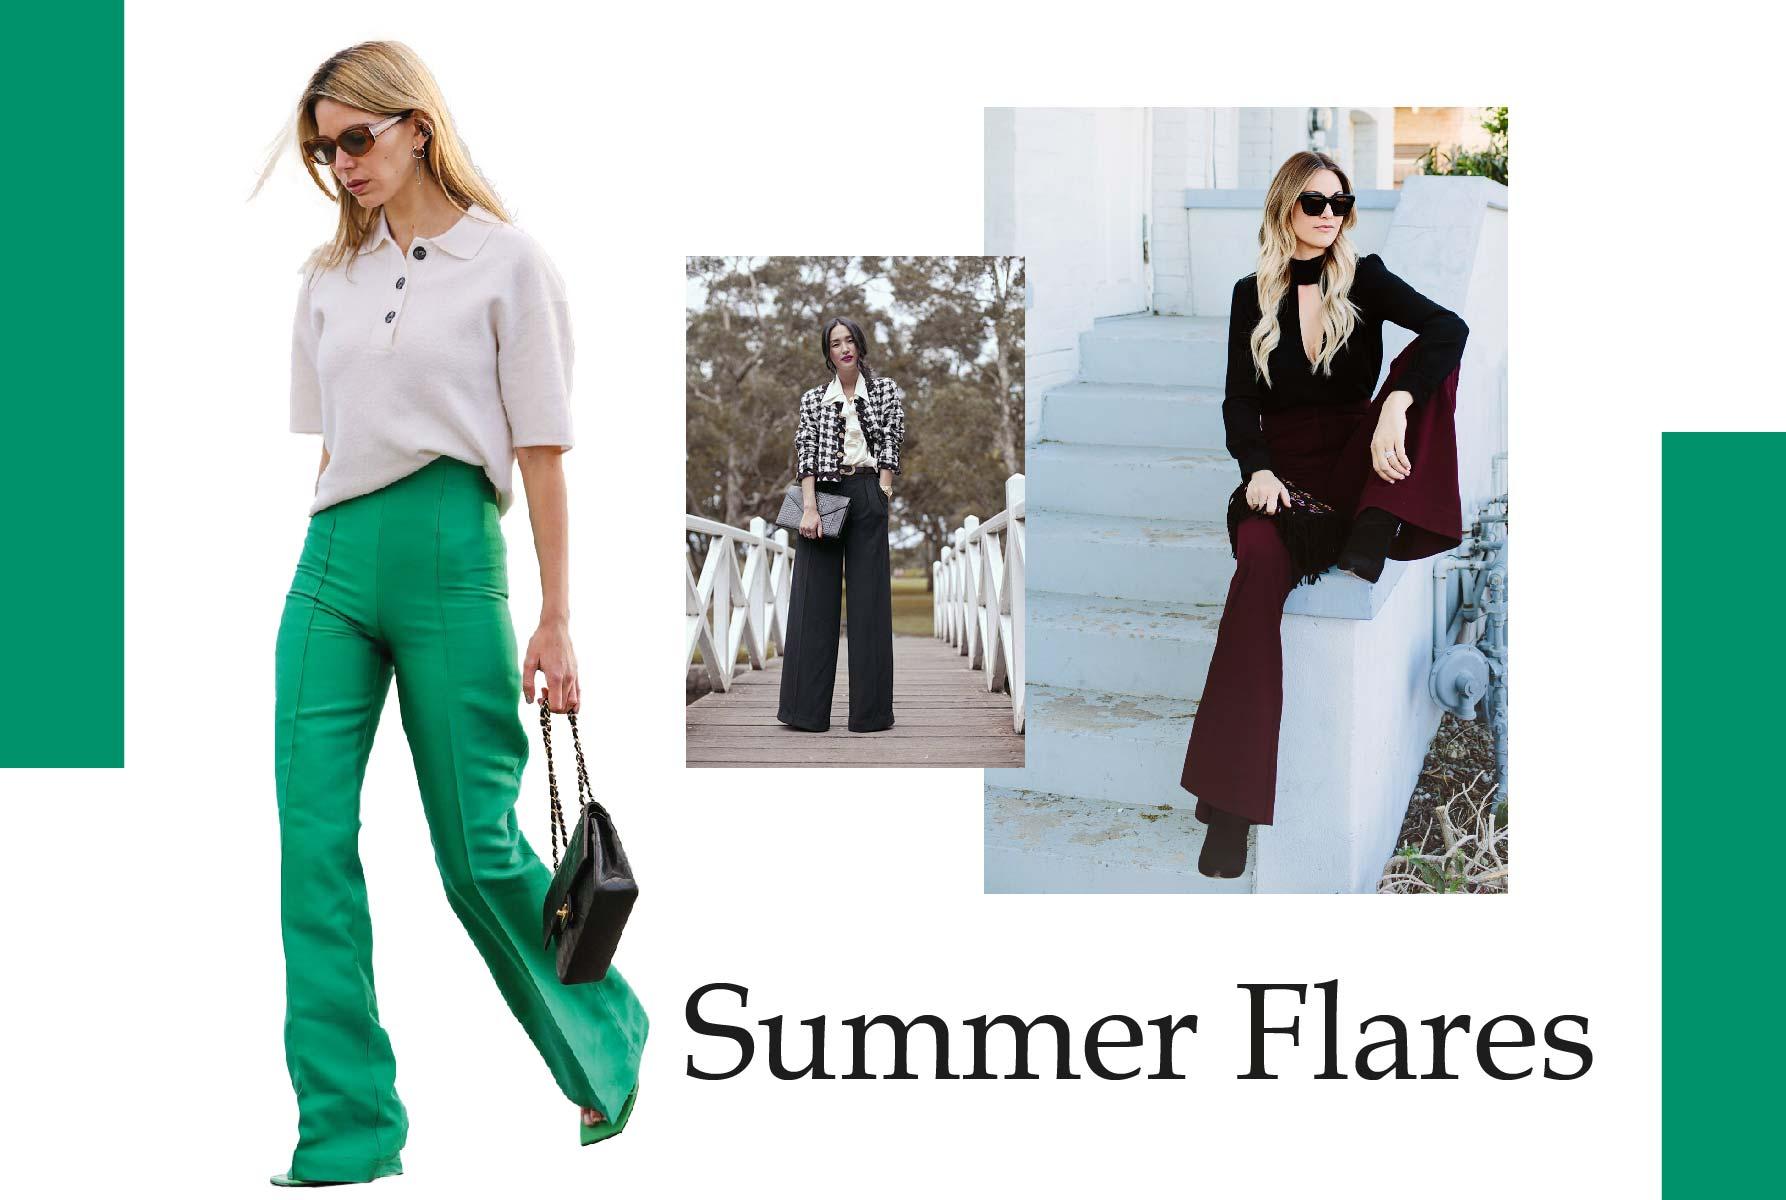 Summer Flares